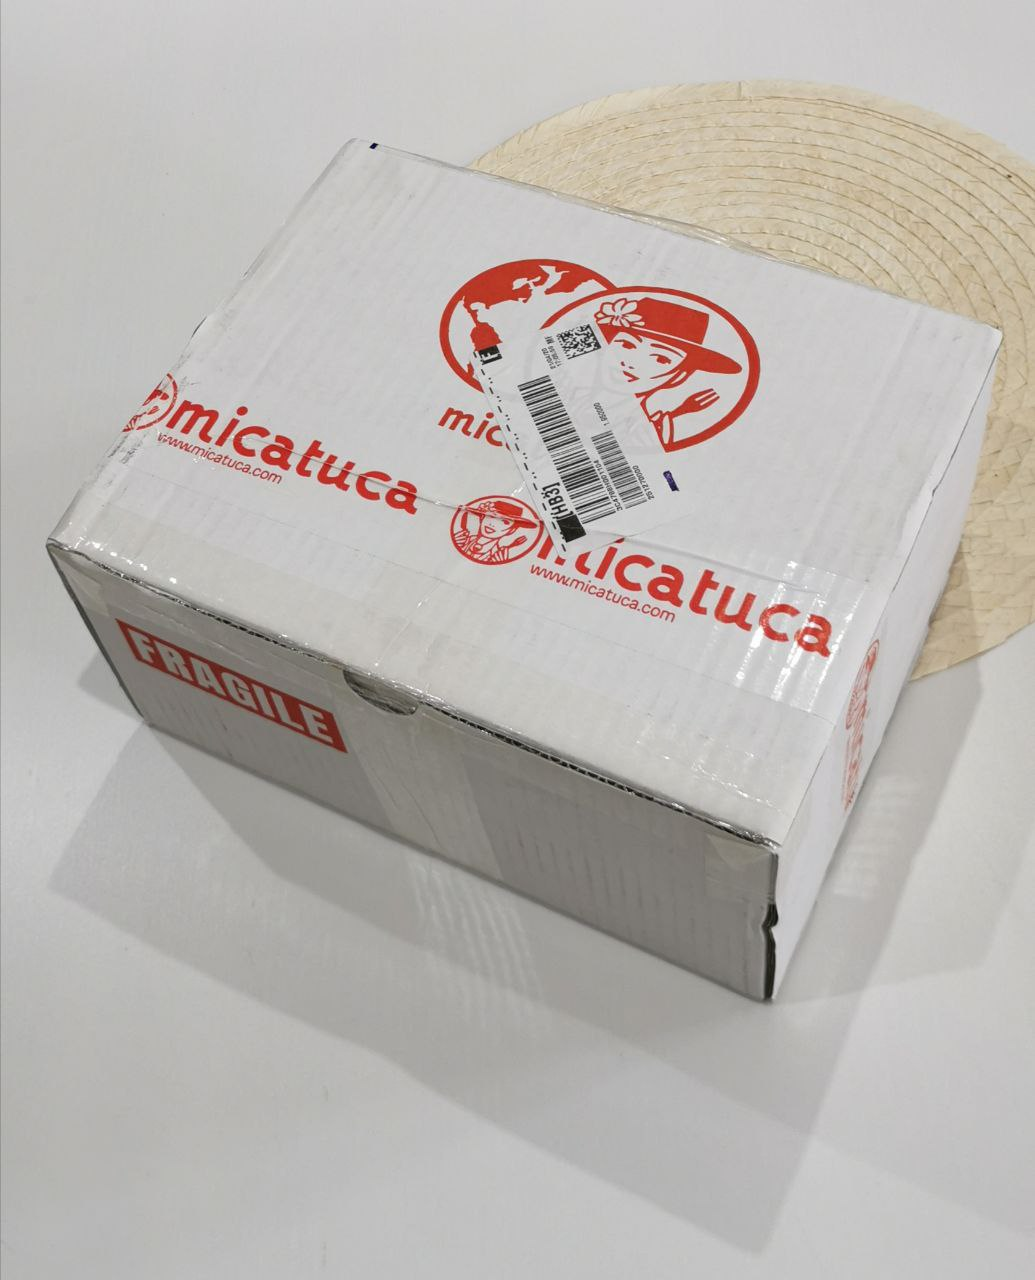 ricetta veloce egitto micatuca posta box